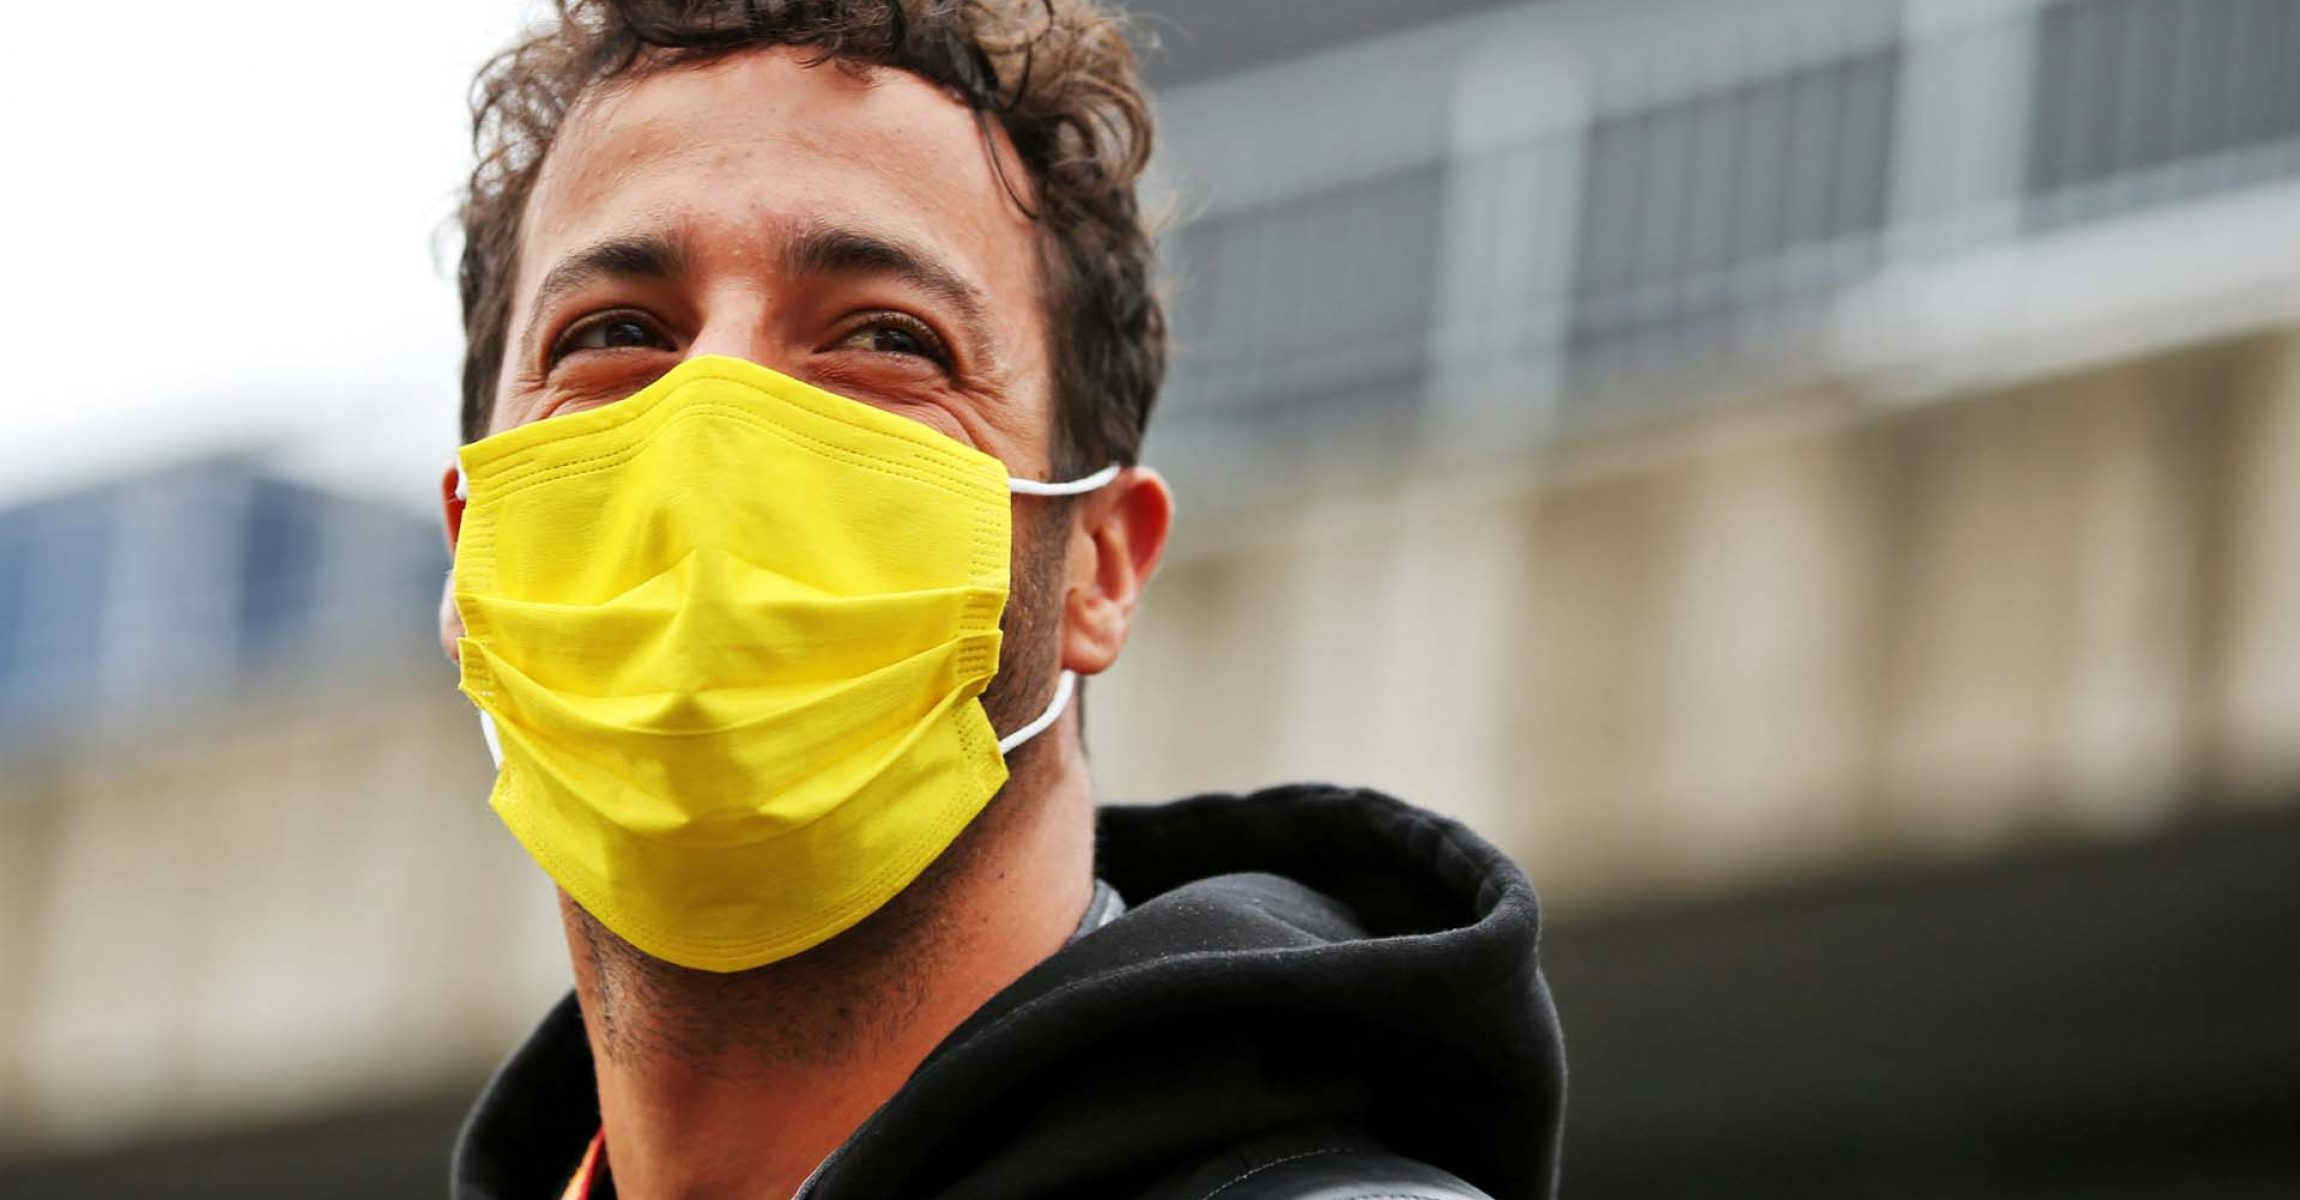 Daniel Ricciardo (AUS) Renault F1 Team. Belgian Grand Prix, Thursday 27th August 2020. Spa-Francorchamps, Belgium.